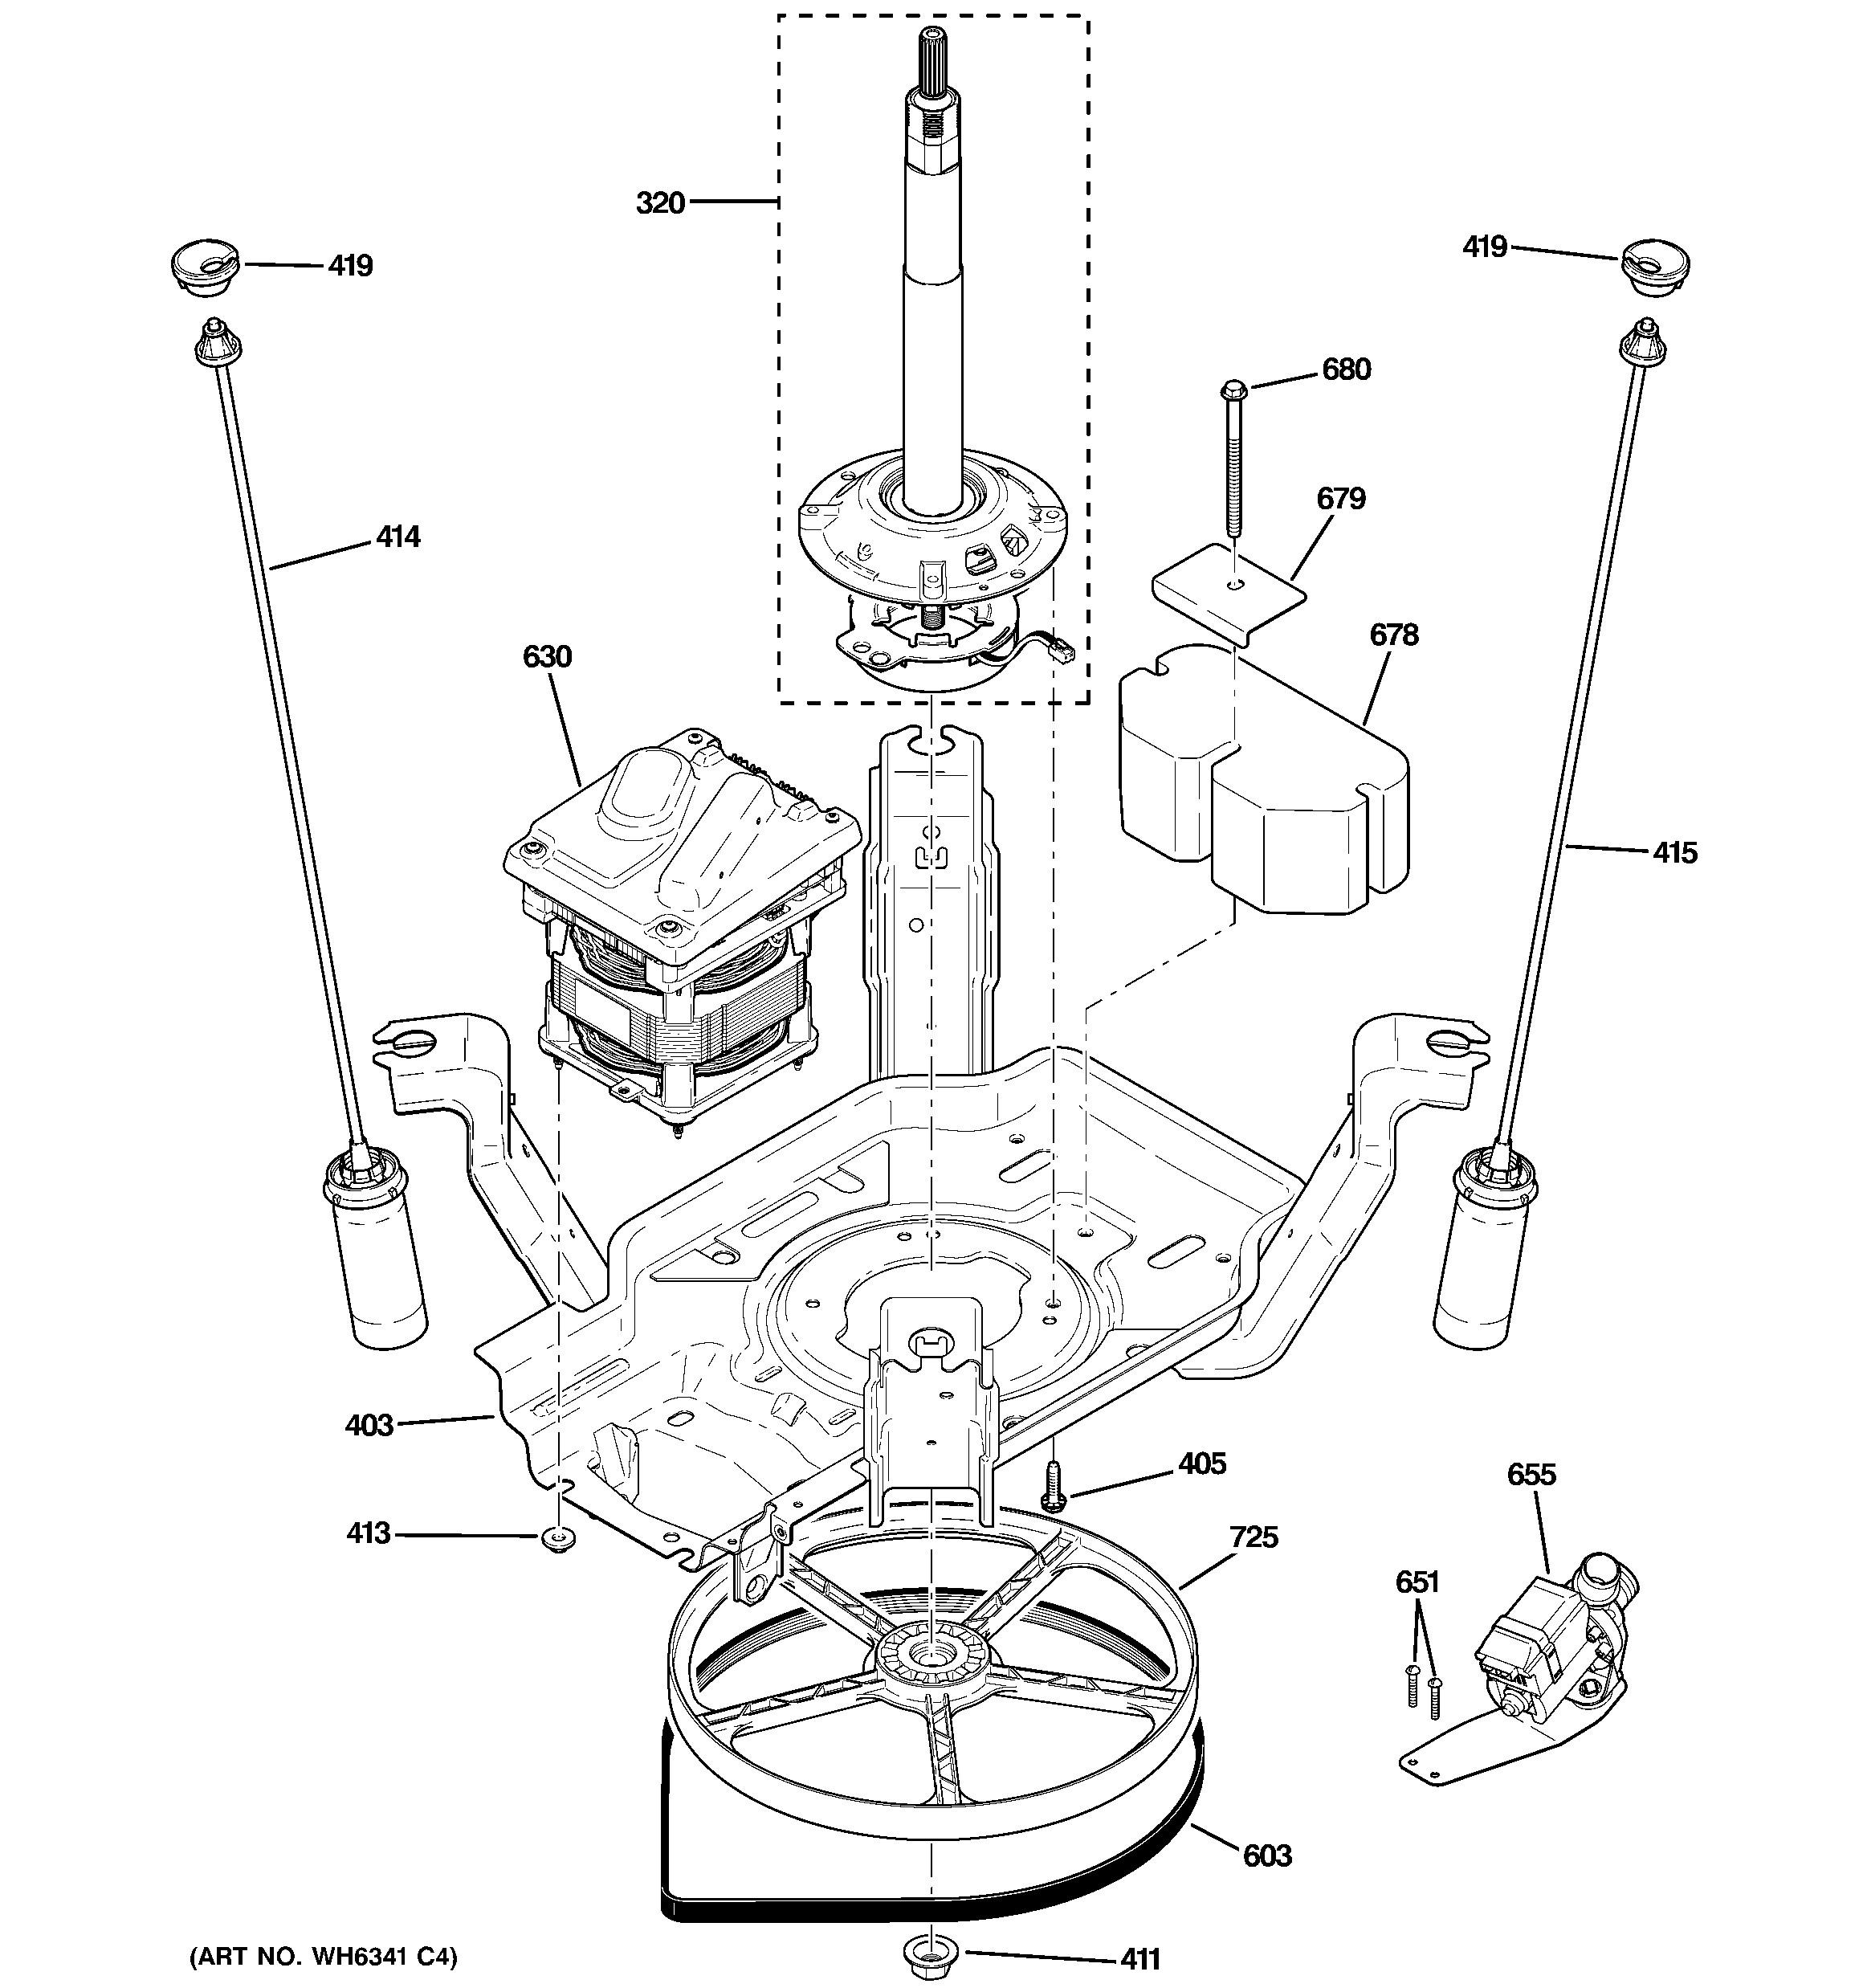 clutch components diagram